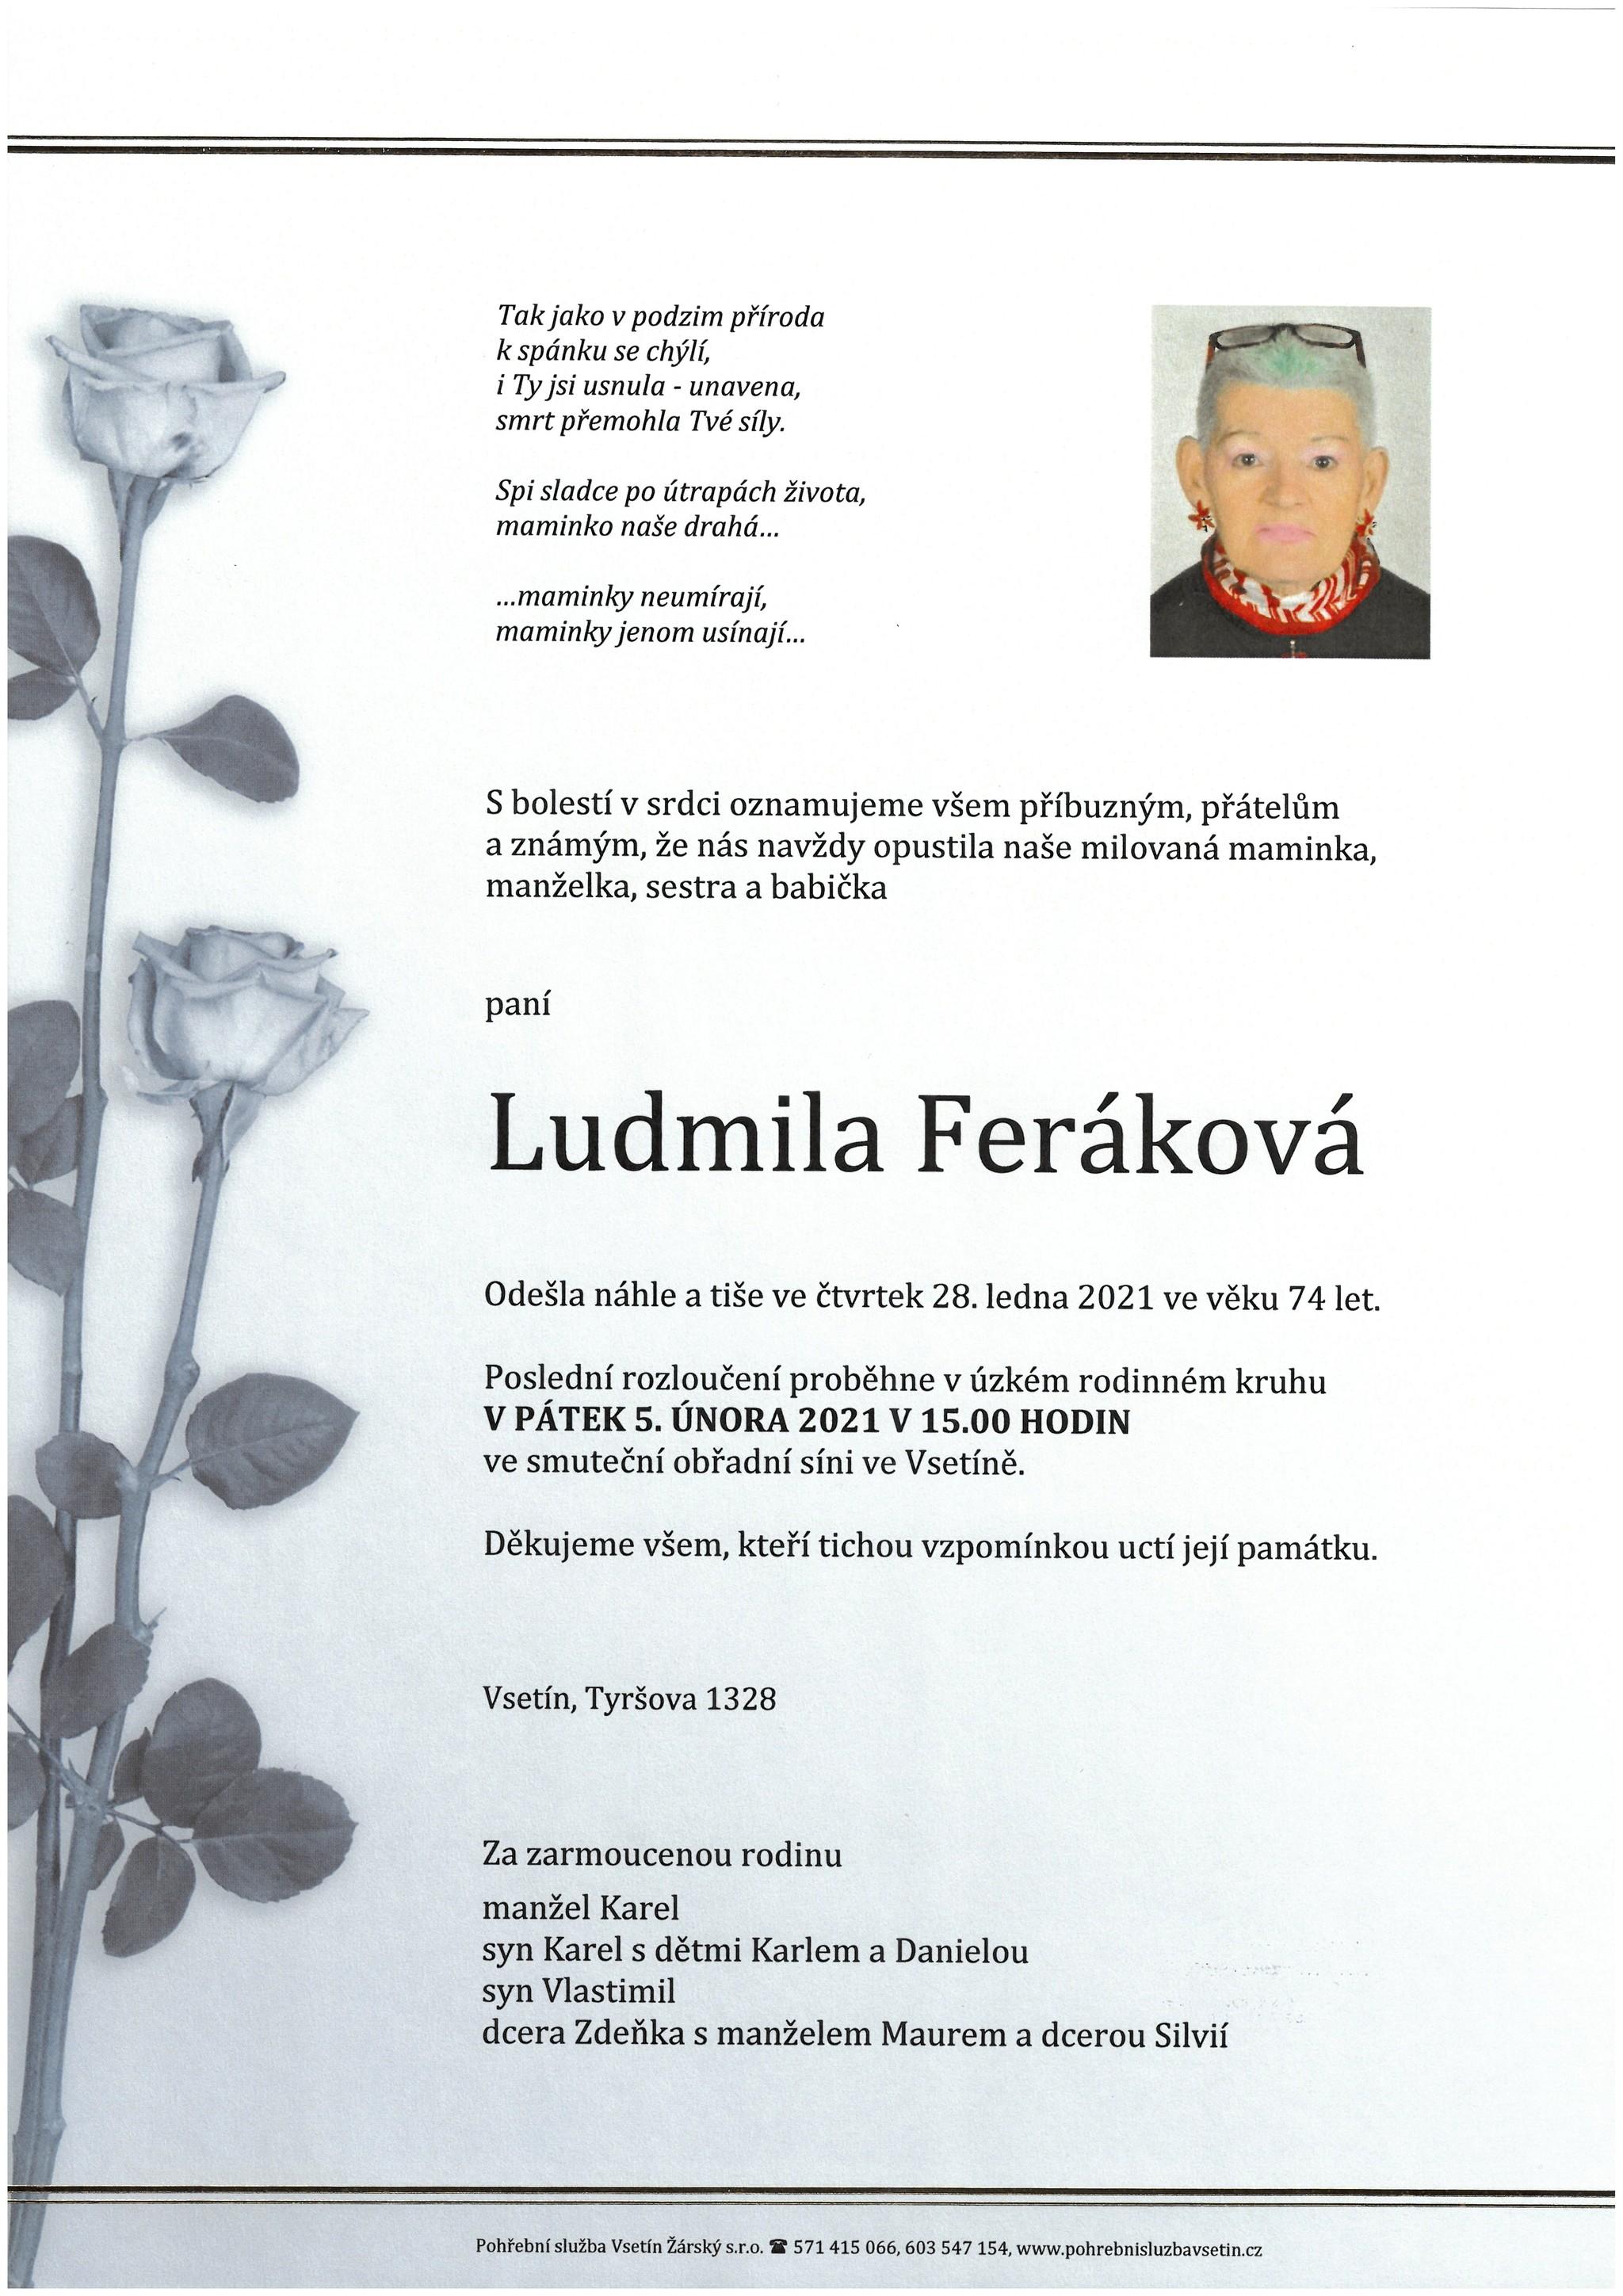 Ludmila Feráková